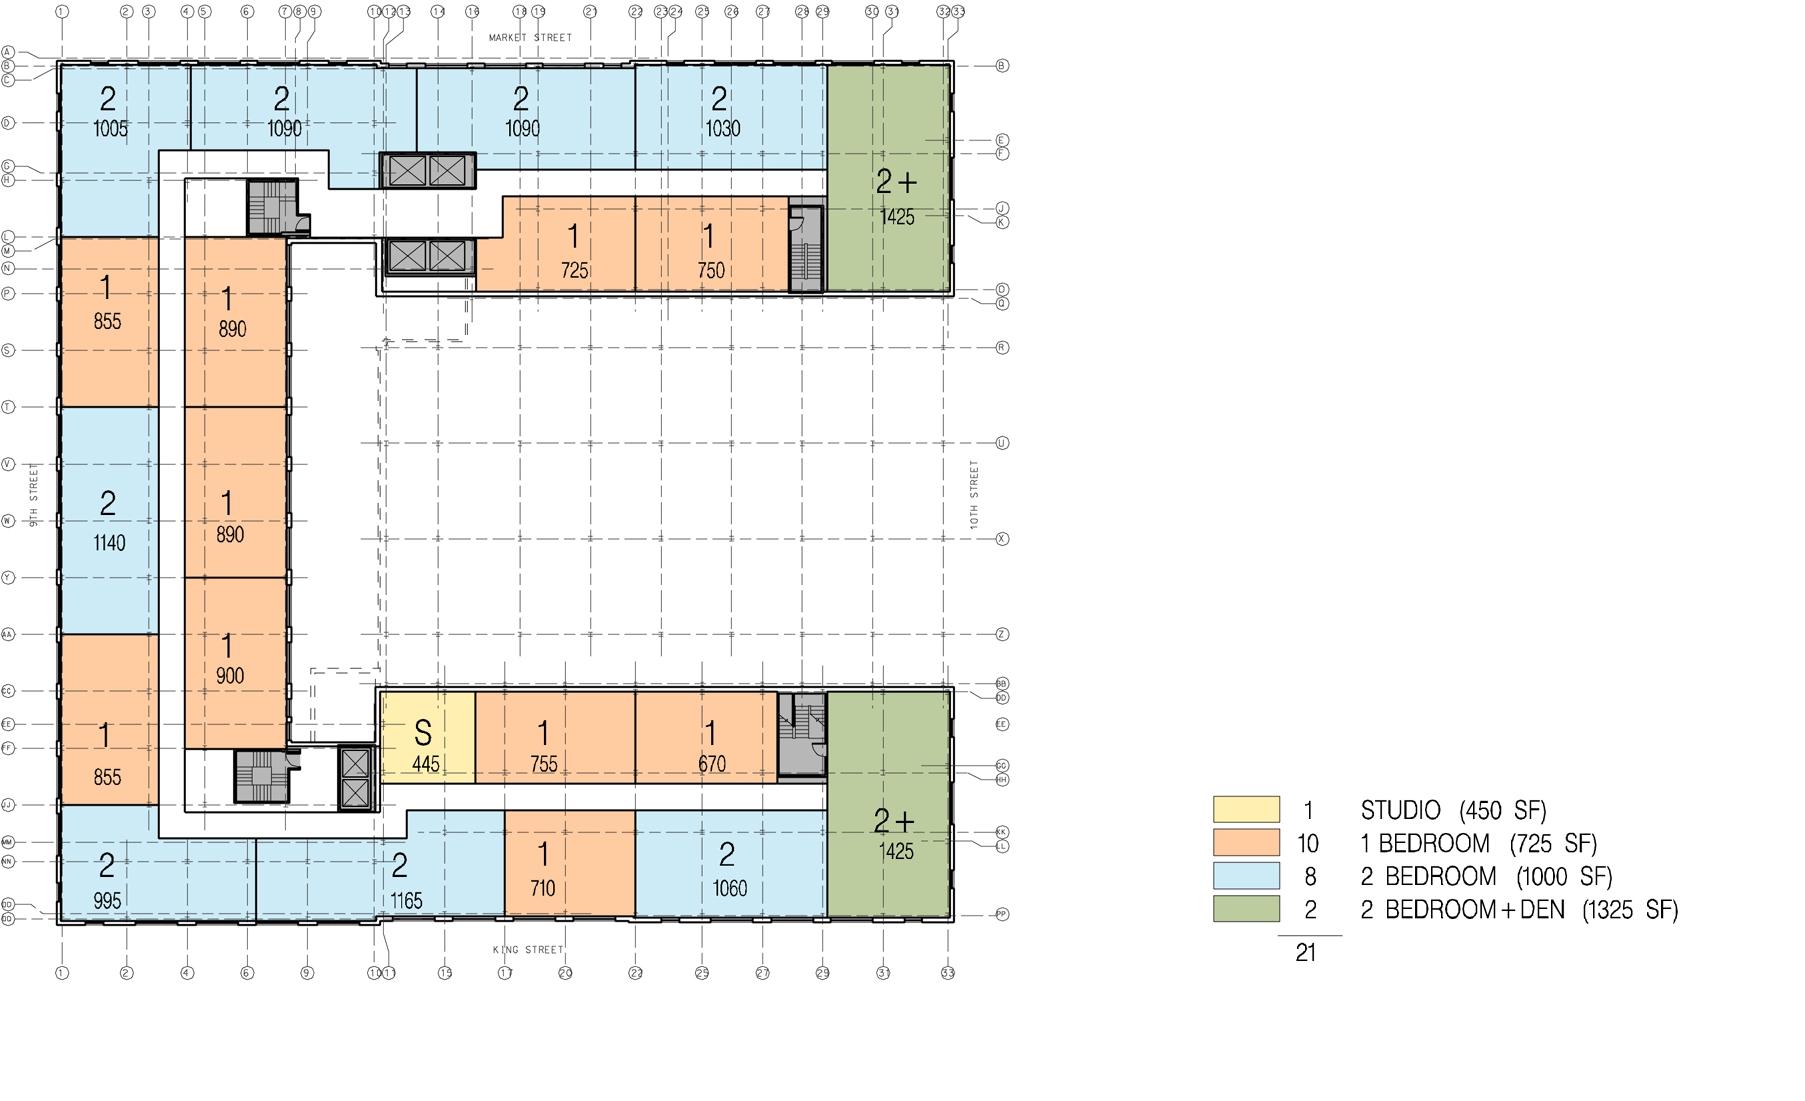 Twelfth + Thirteenth Floor Plans